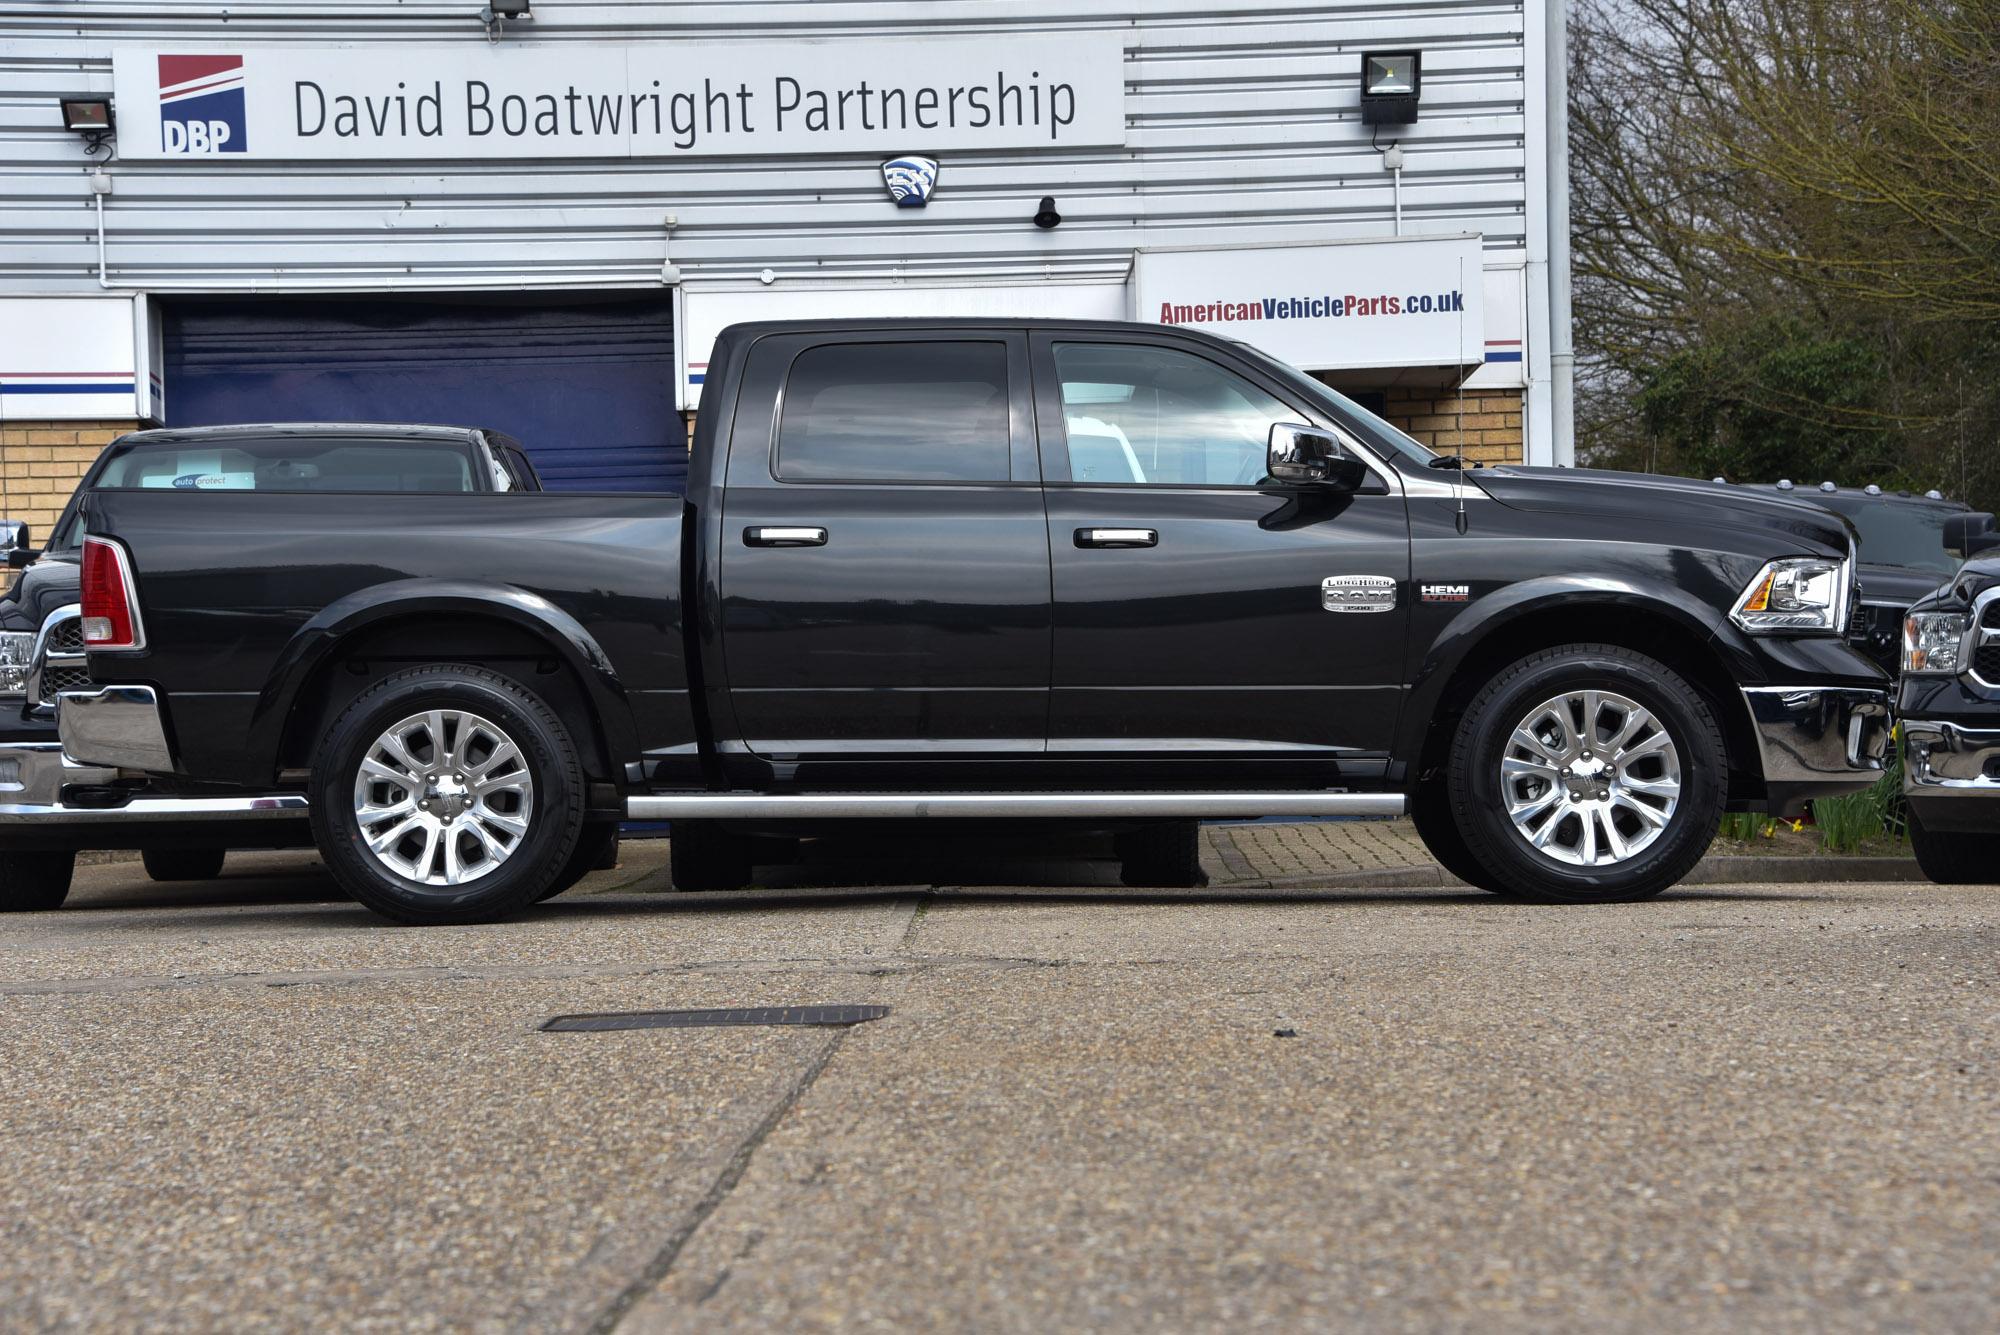 2017 Ford F 150 For Sale >> New 2017 Dodge Ram Longhorn Crew – David Boatwright Partnership | Dodge Ram | F-150 | Challenger